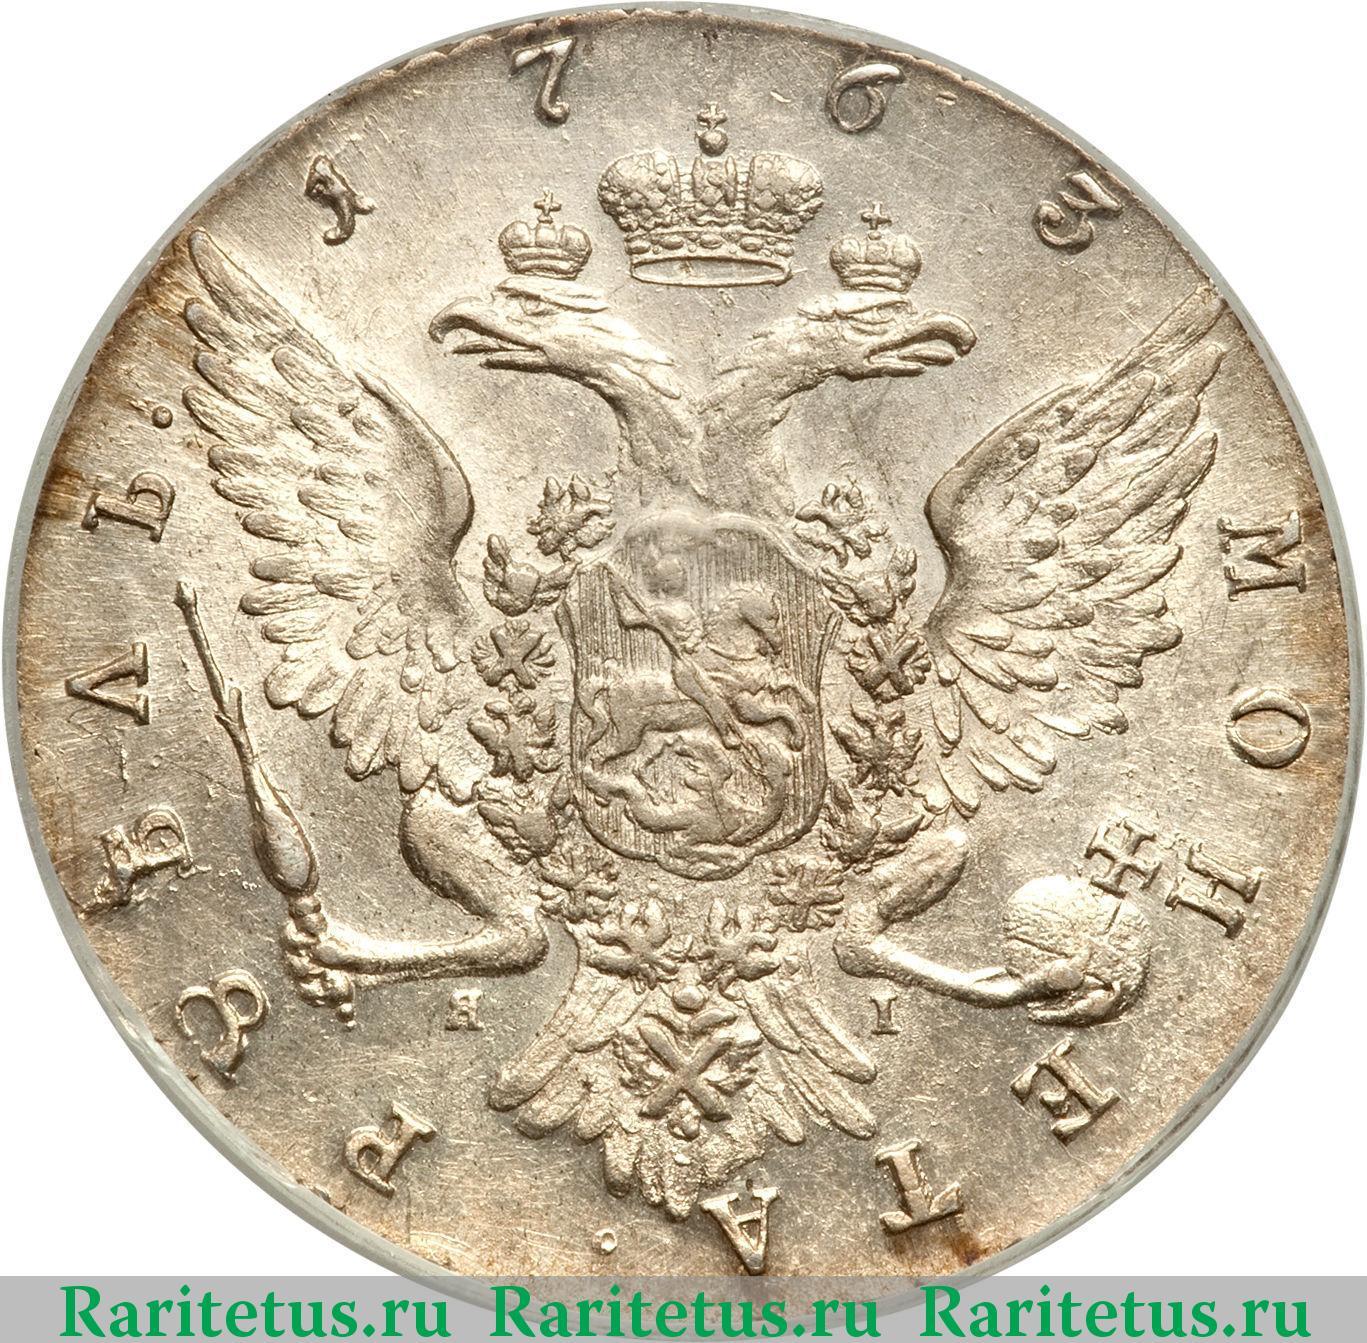 1 рубль 1763 года цена mars tiger